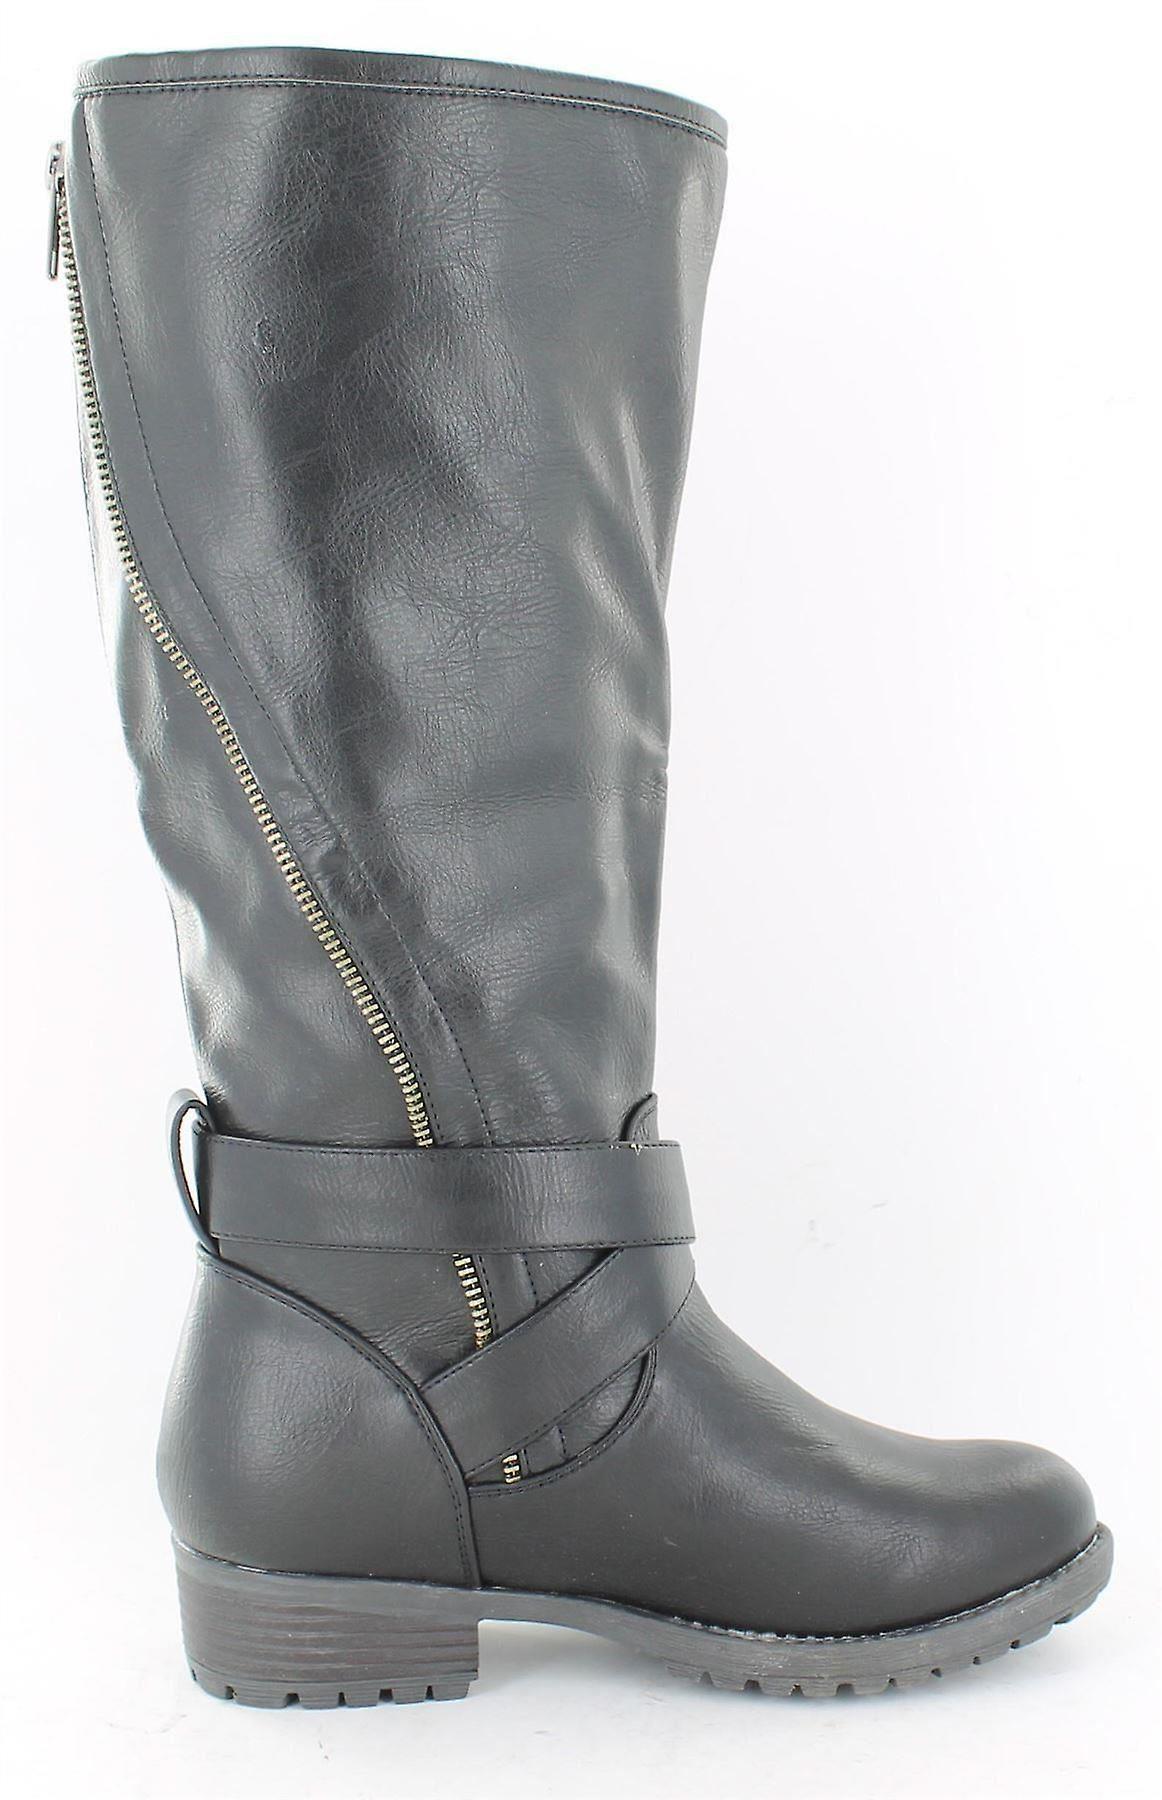 Ladies Spot On Asymmetric Zip Biker Style Boots Black Size 6